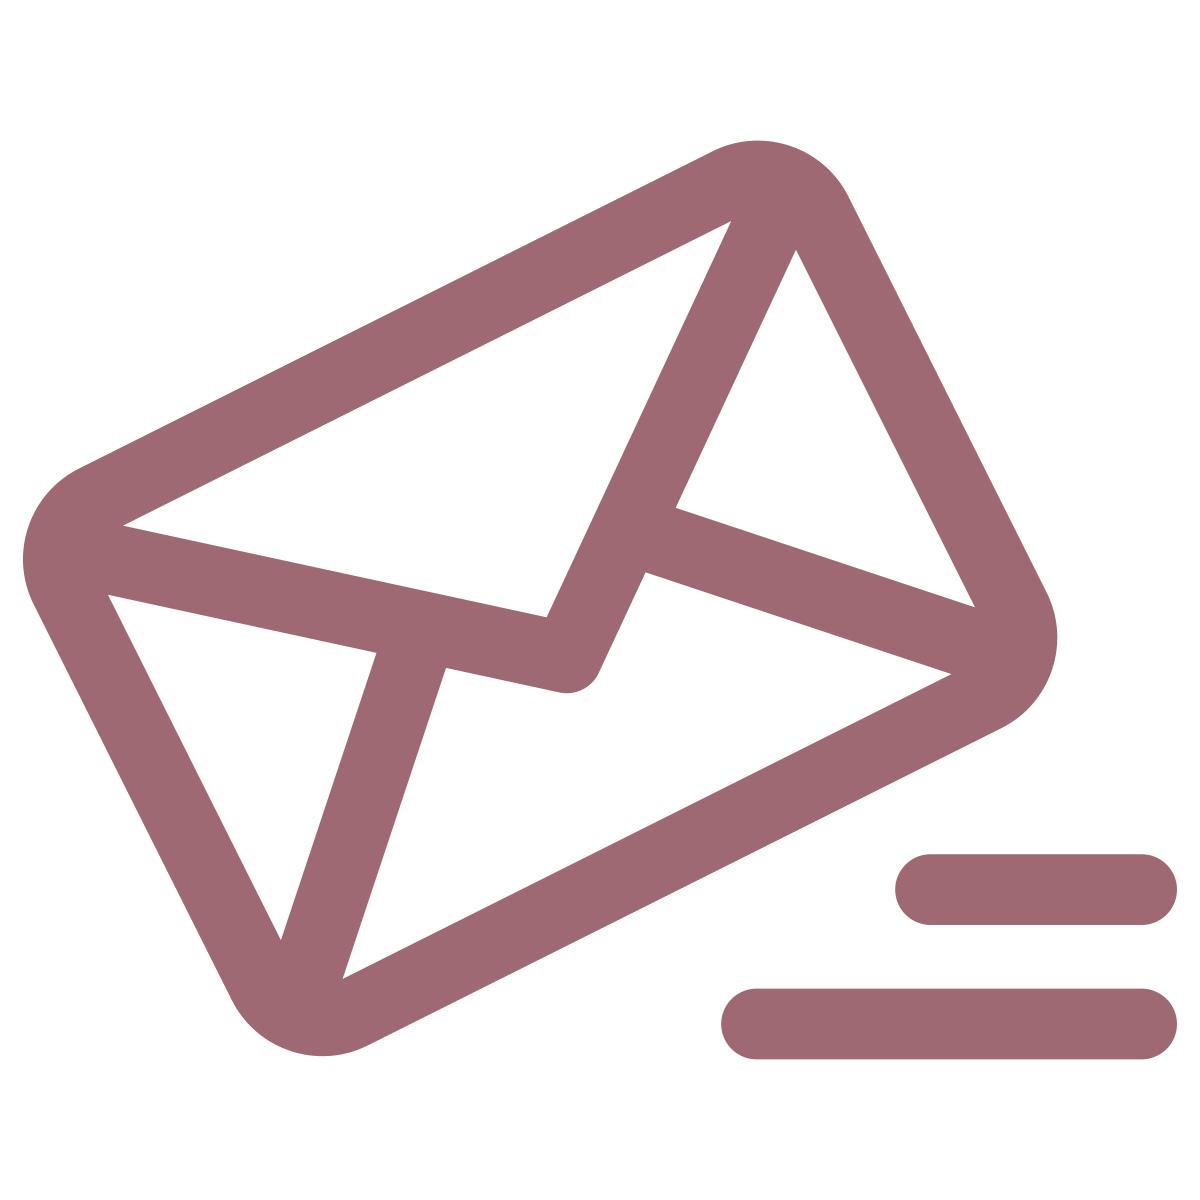 noun_Email_1028810_9e6973.png